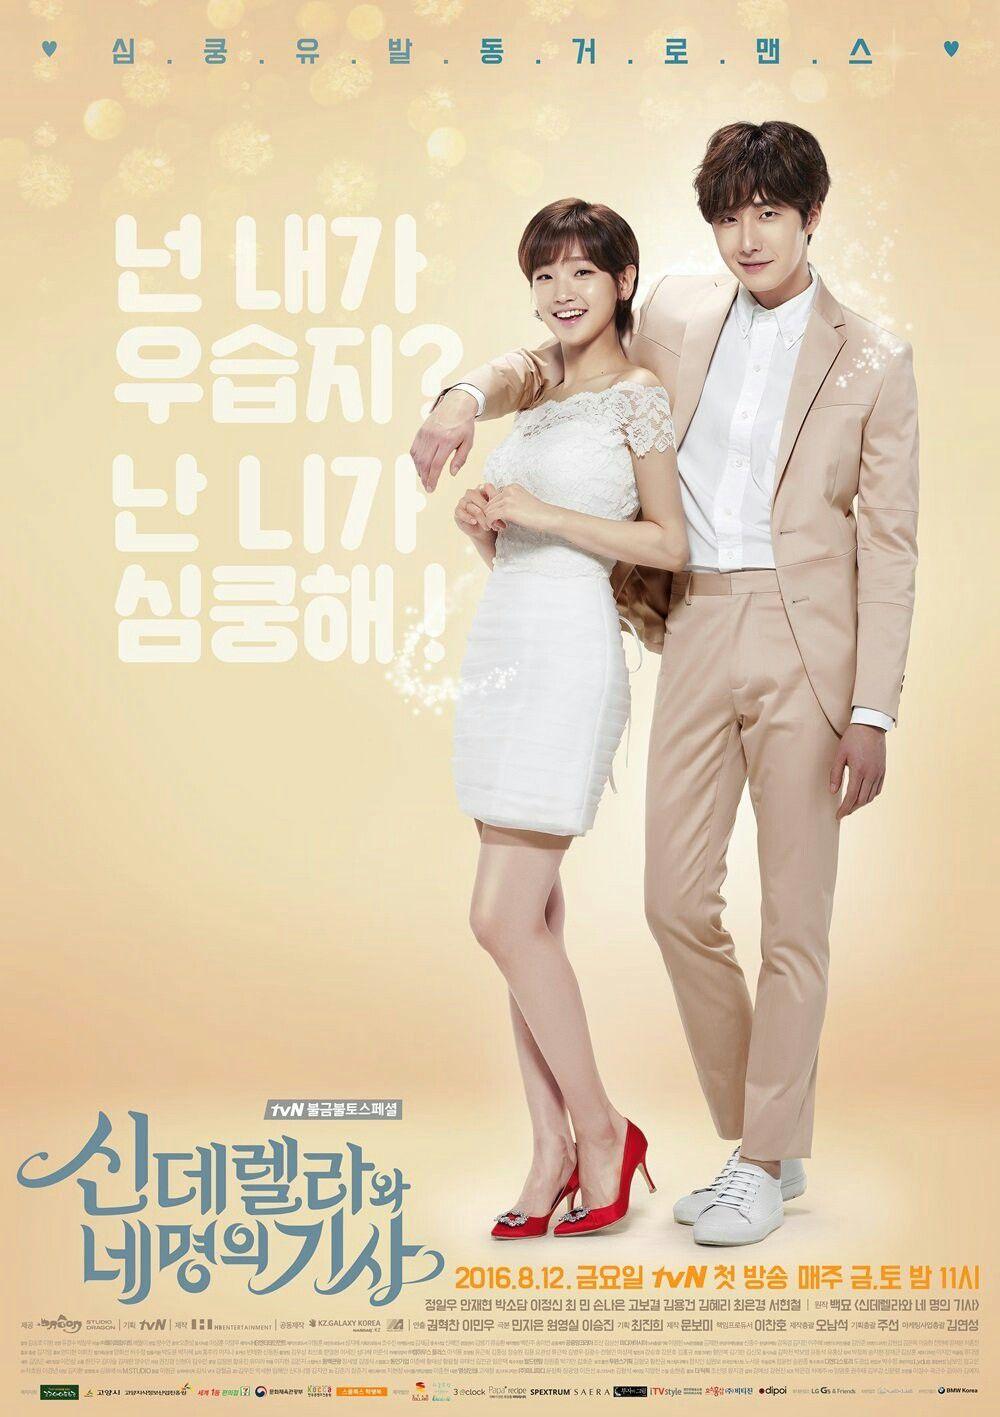 Sinopsis Drama Korea Cinderella And Four Knight : sinopsis, drama, korea, cinderella, knight, Cinderella, Knights